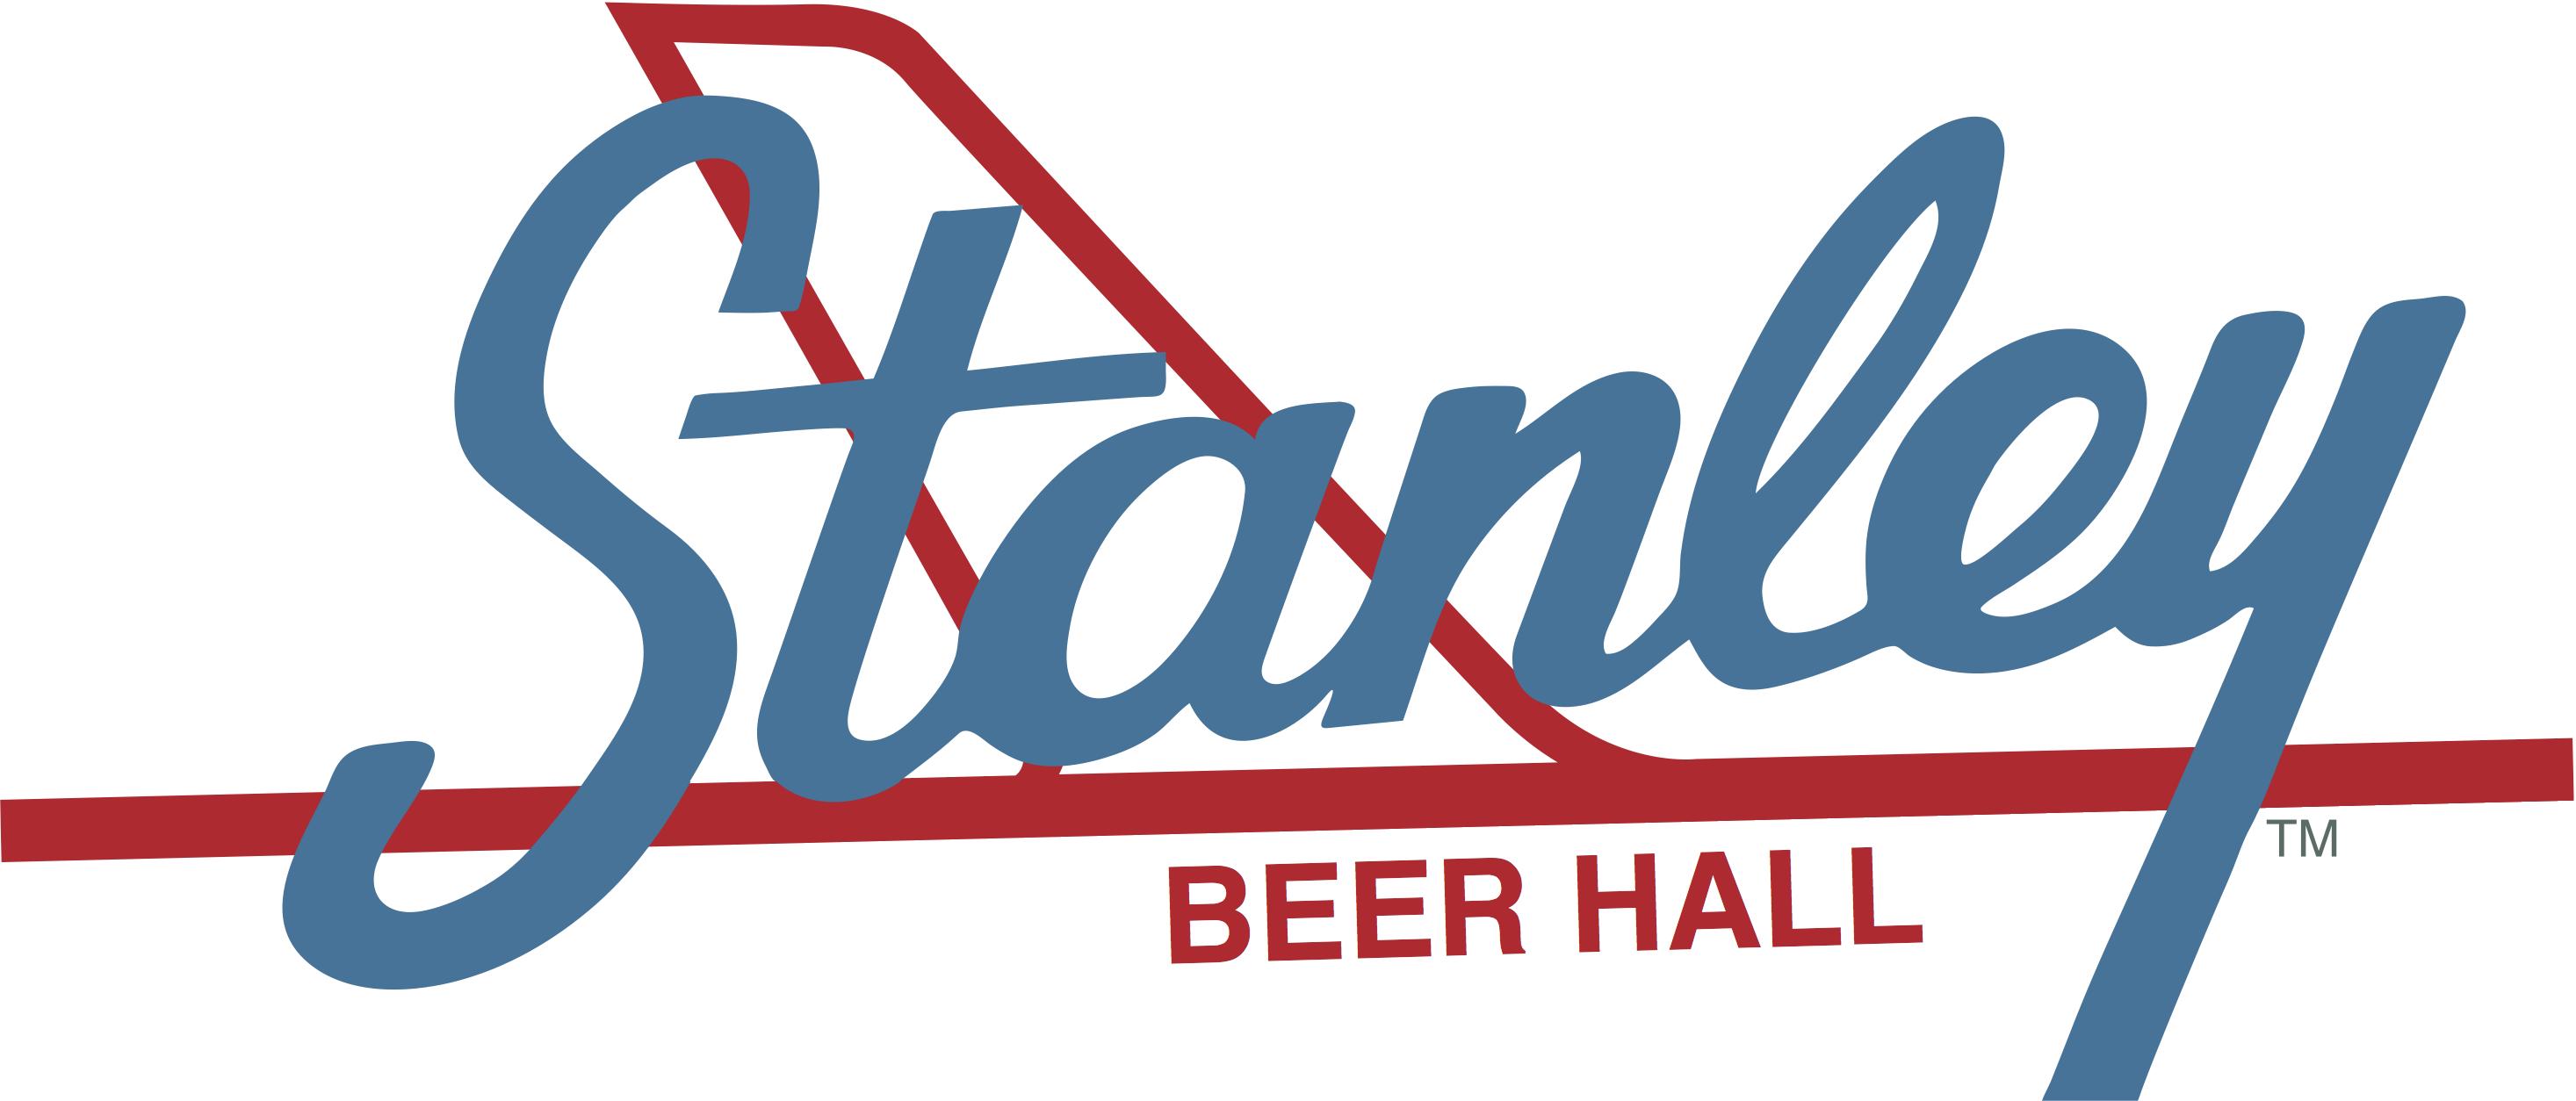 Stanley Beer Hall